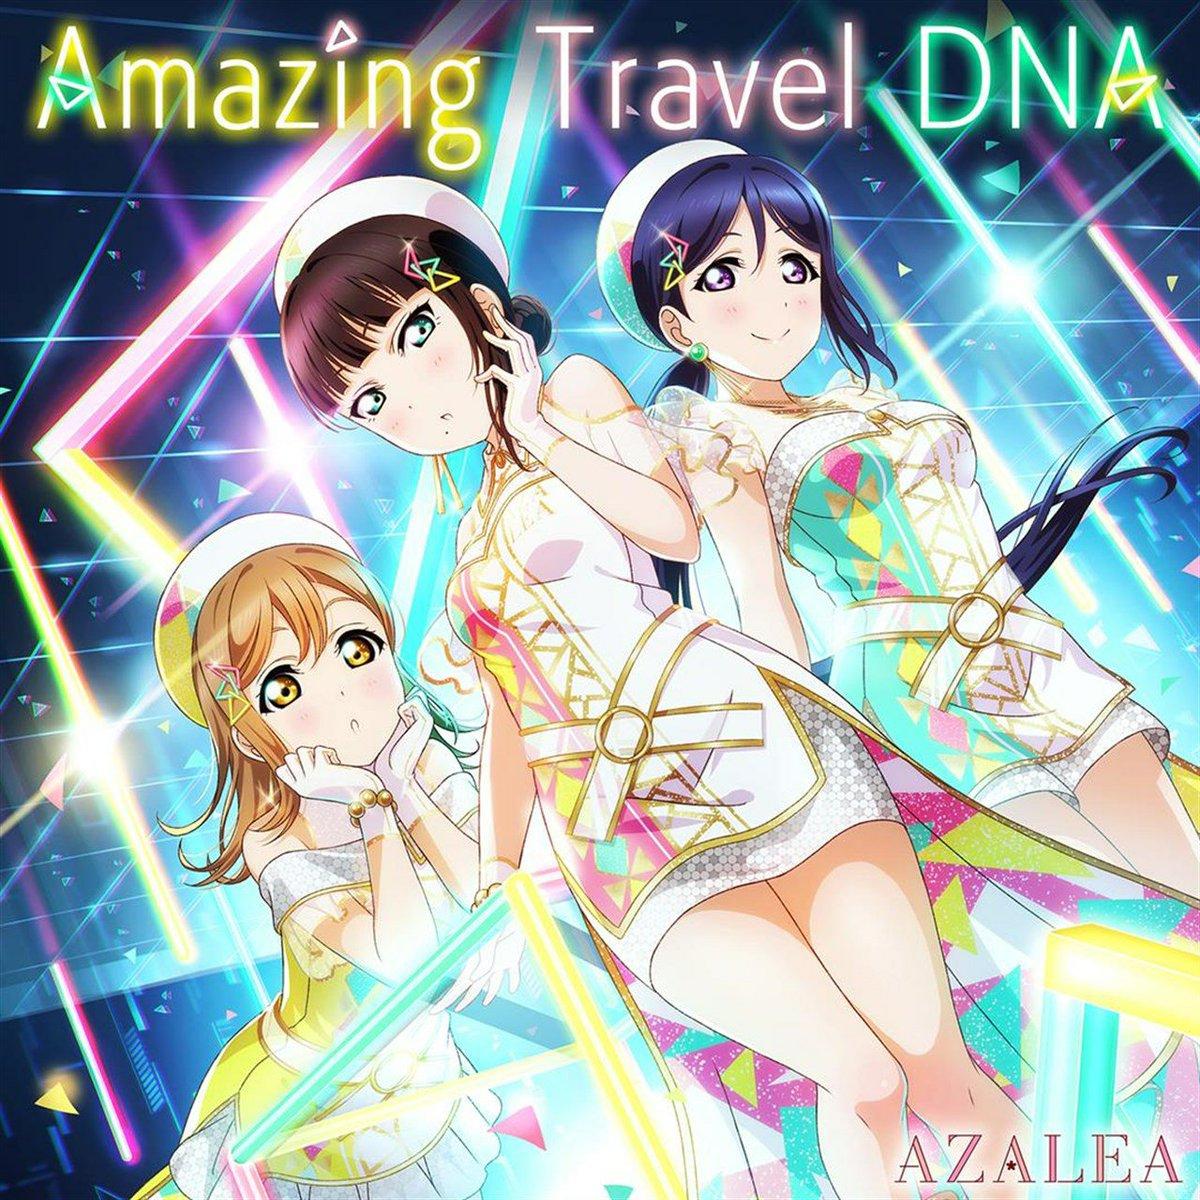 test ツイッターメディア - #brawPlaying Amazing Travel DNA - AZALEA (諏訪ななか, 小宮有紗, 高槻かなこ) (Amazing Travel DNA) https://t.co/UydMNoFLXs